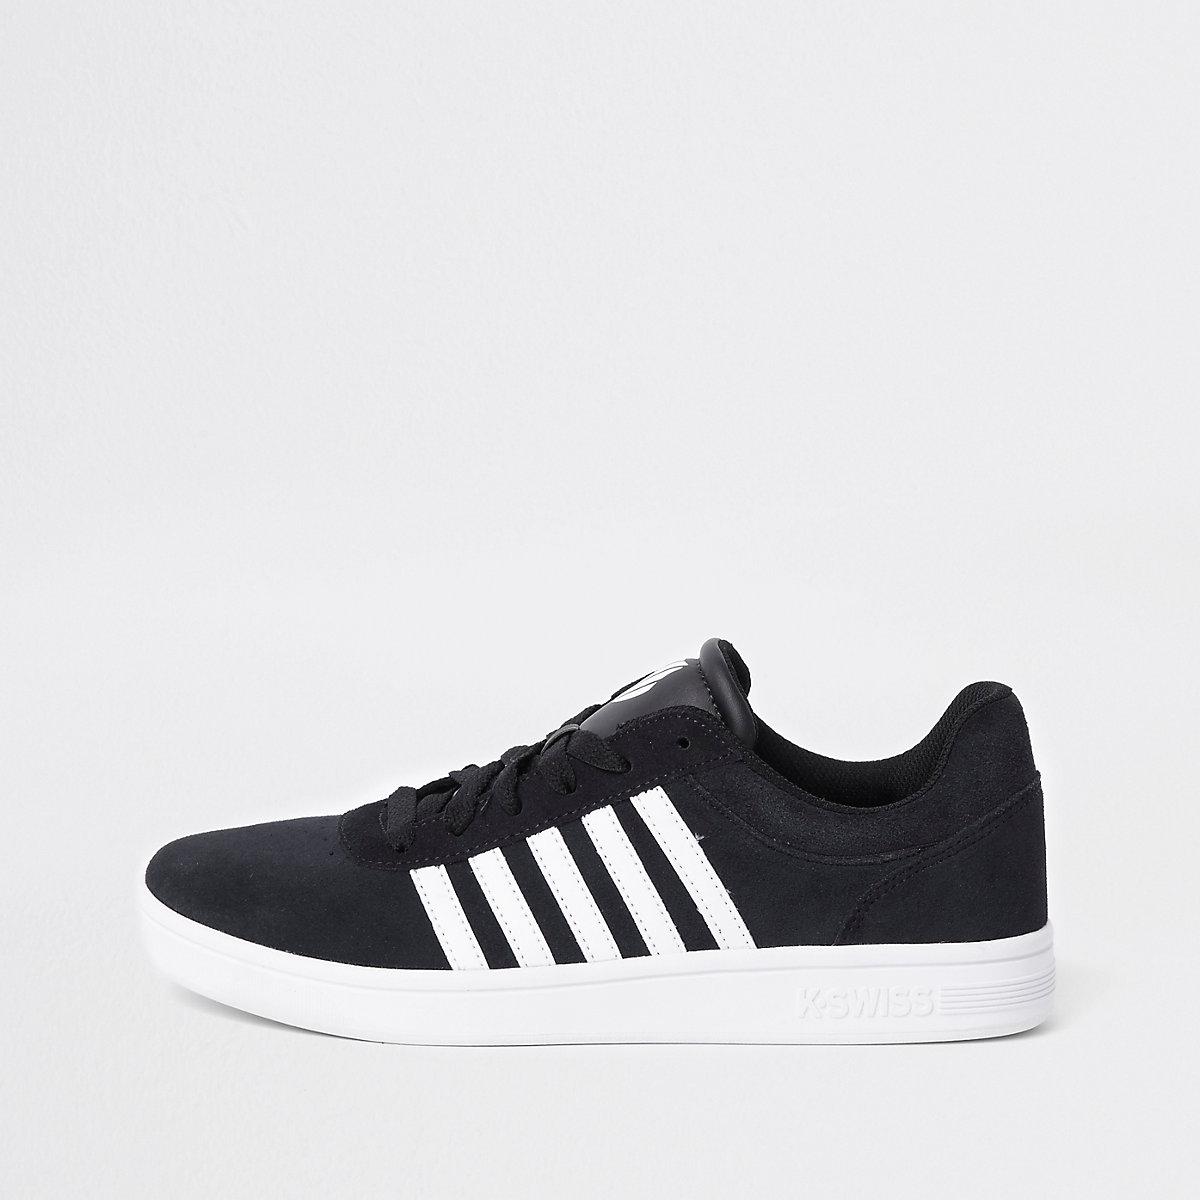 K-Swiss black low top court runner sneakers